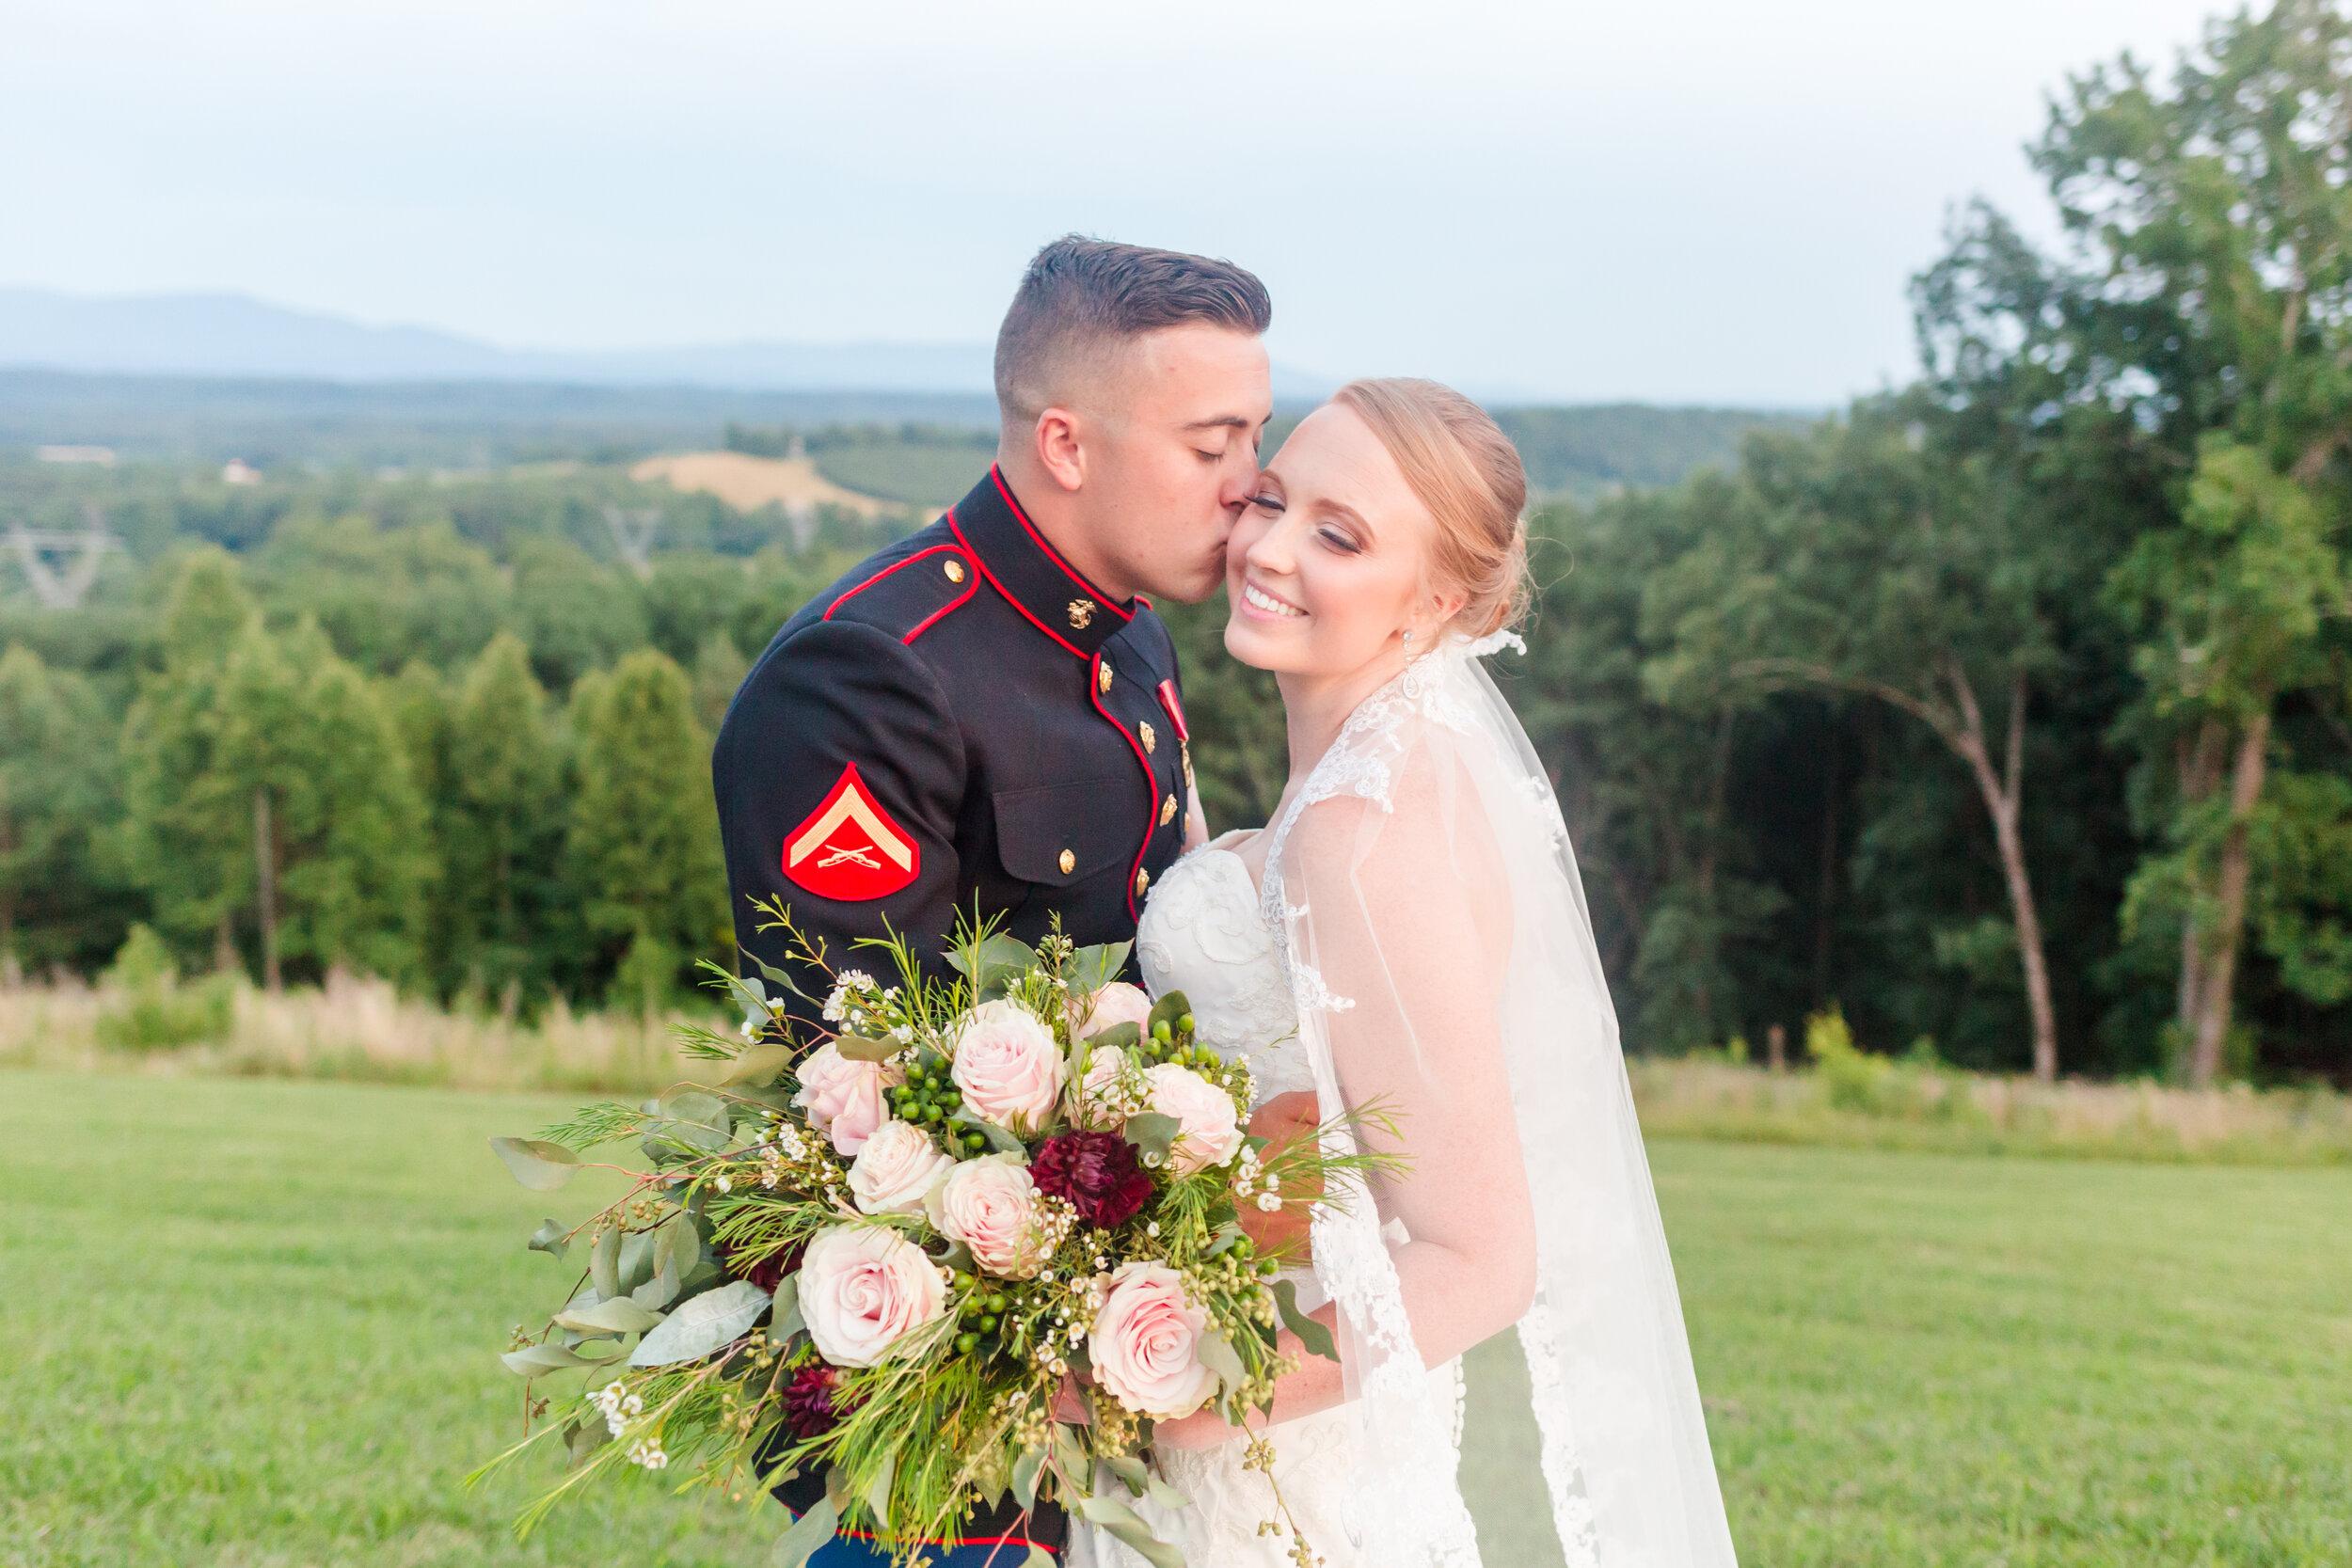 Ella & Will Vineyard - June 13, 2019Ivy Breanne Photography